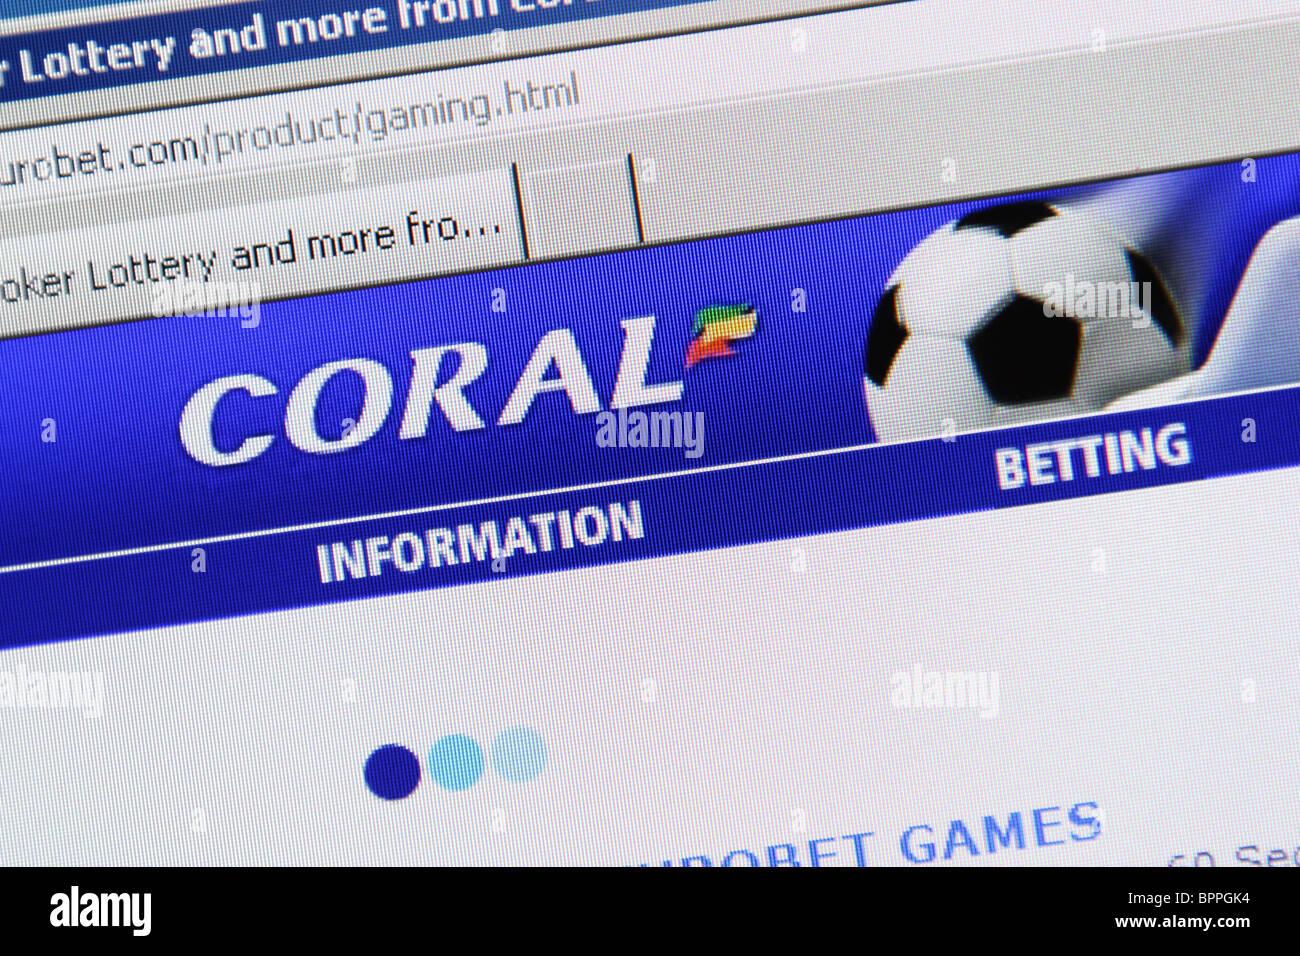 Coral sports betting poker lottery gambling - Stock Image